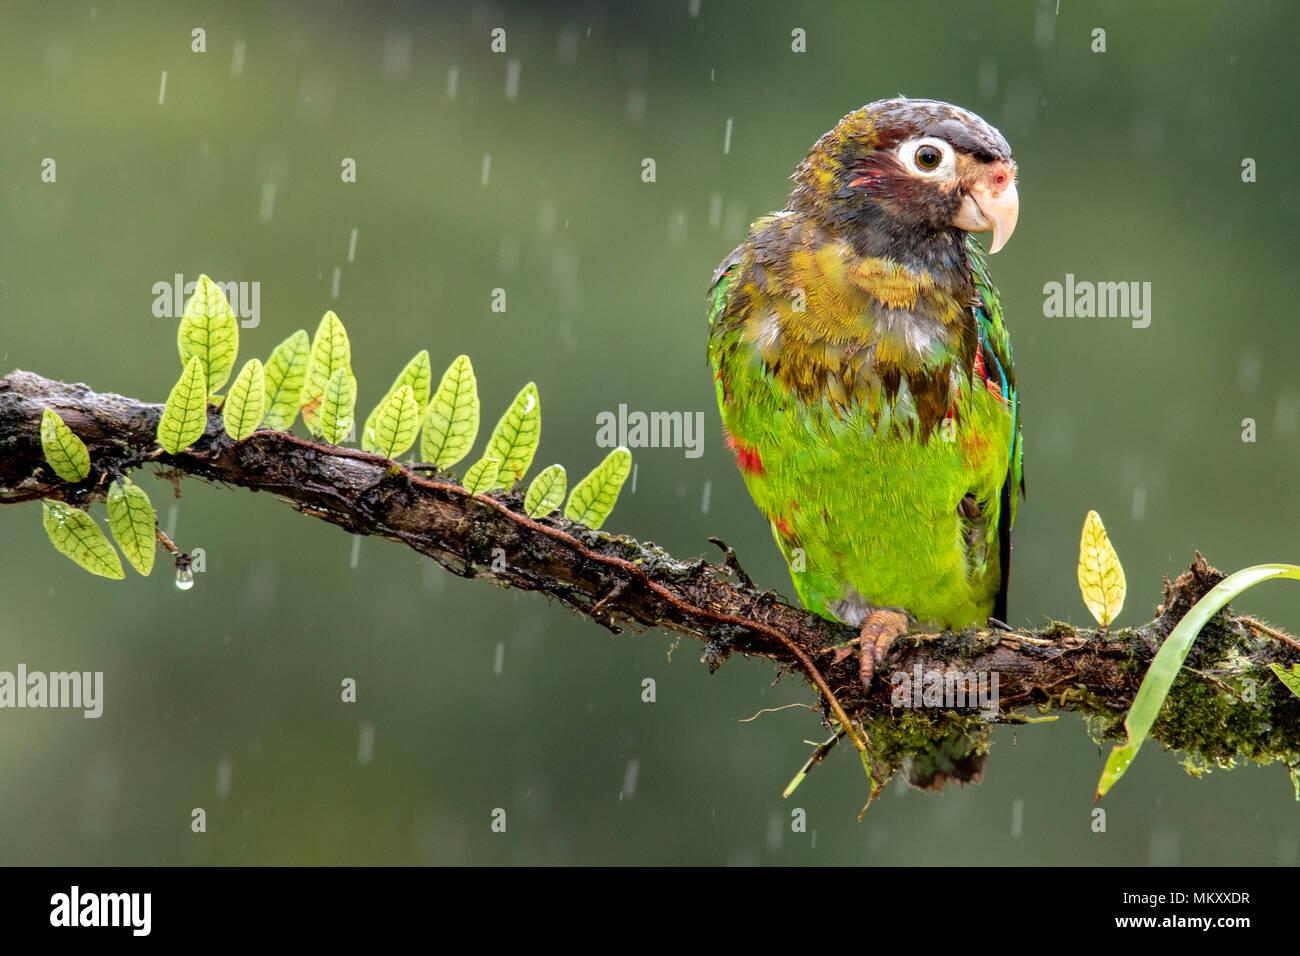 Brown-hooded Parrot (Pyrilia haematotis) in the rain - La Laguna del Lagarto Lodge, Boca Tapada, Costa Rica - Stock Image